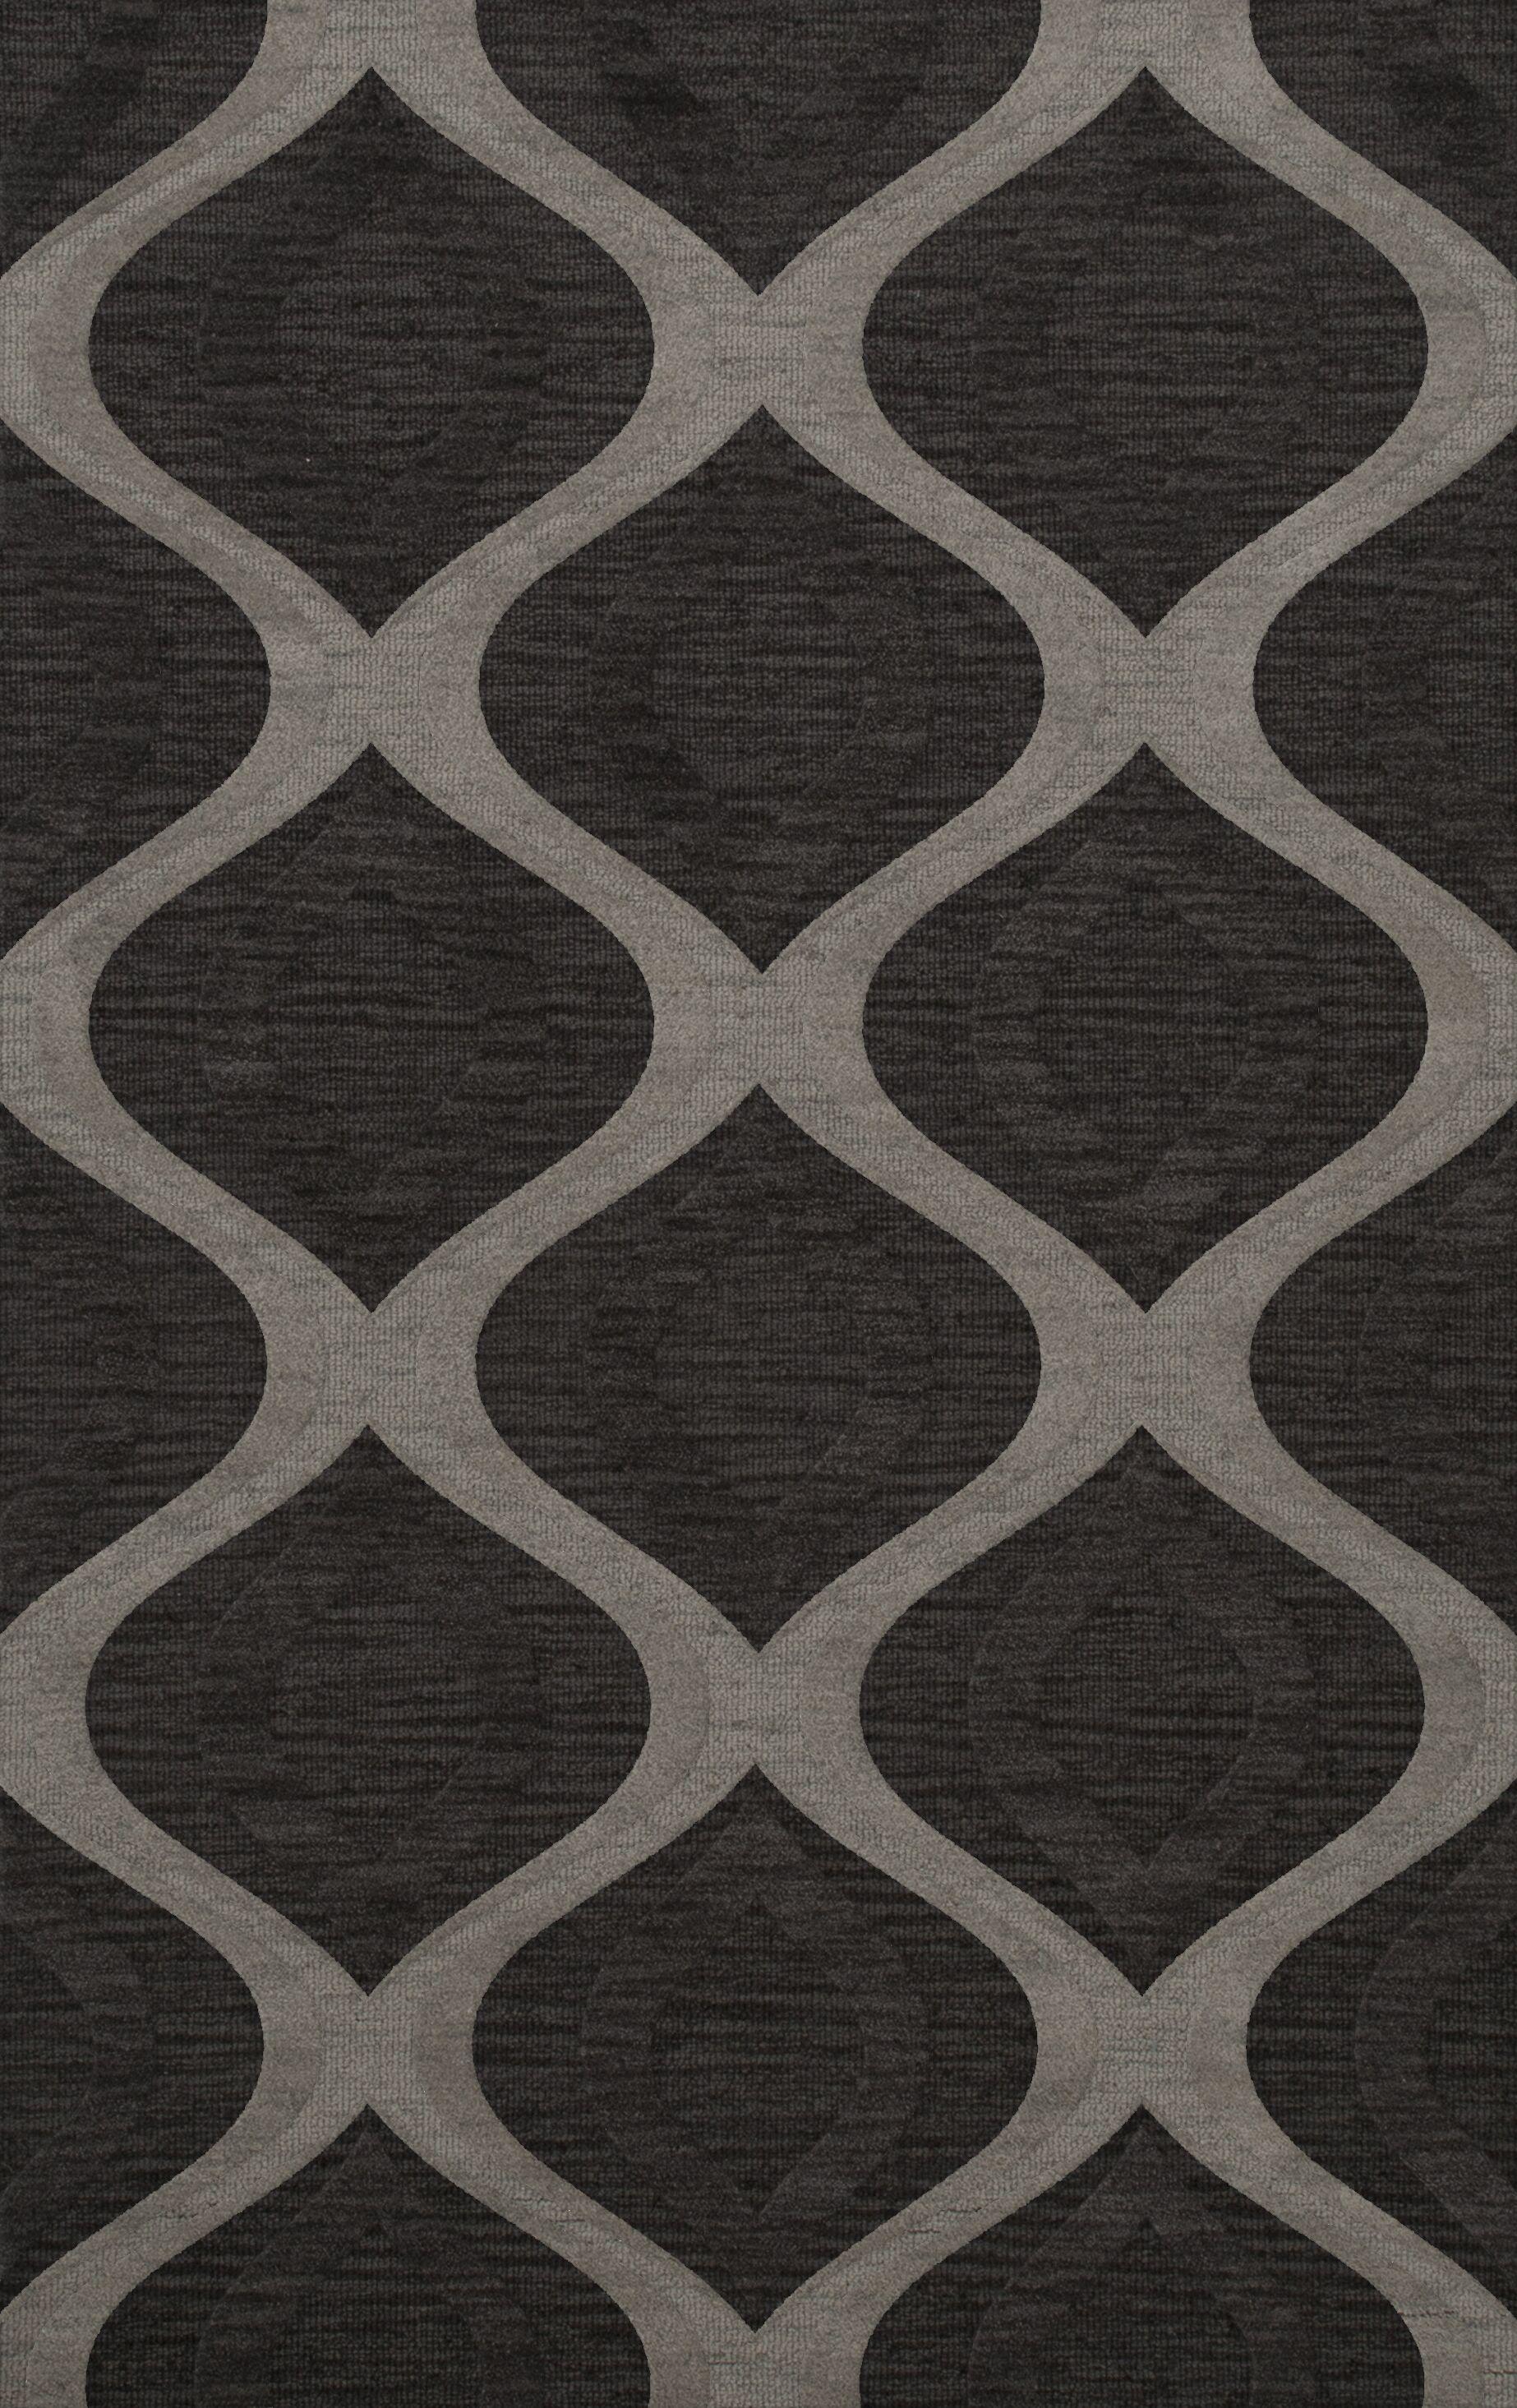 Sarahi Wool Metal Area Rug Rug Size: Rectangle 5' x 8'